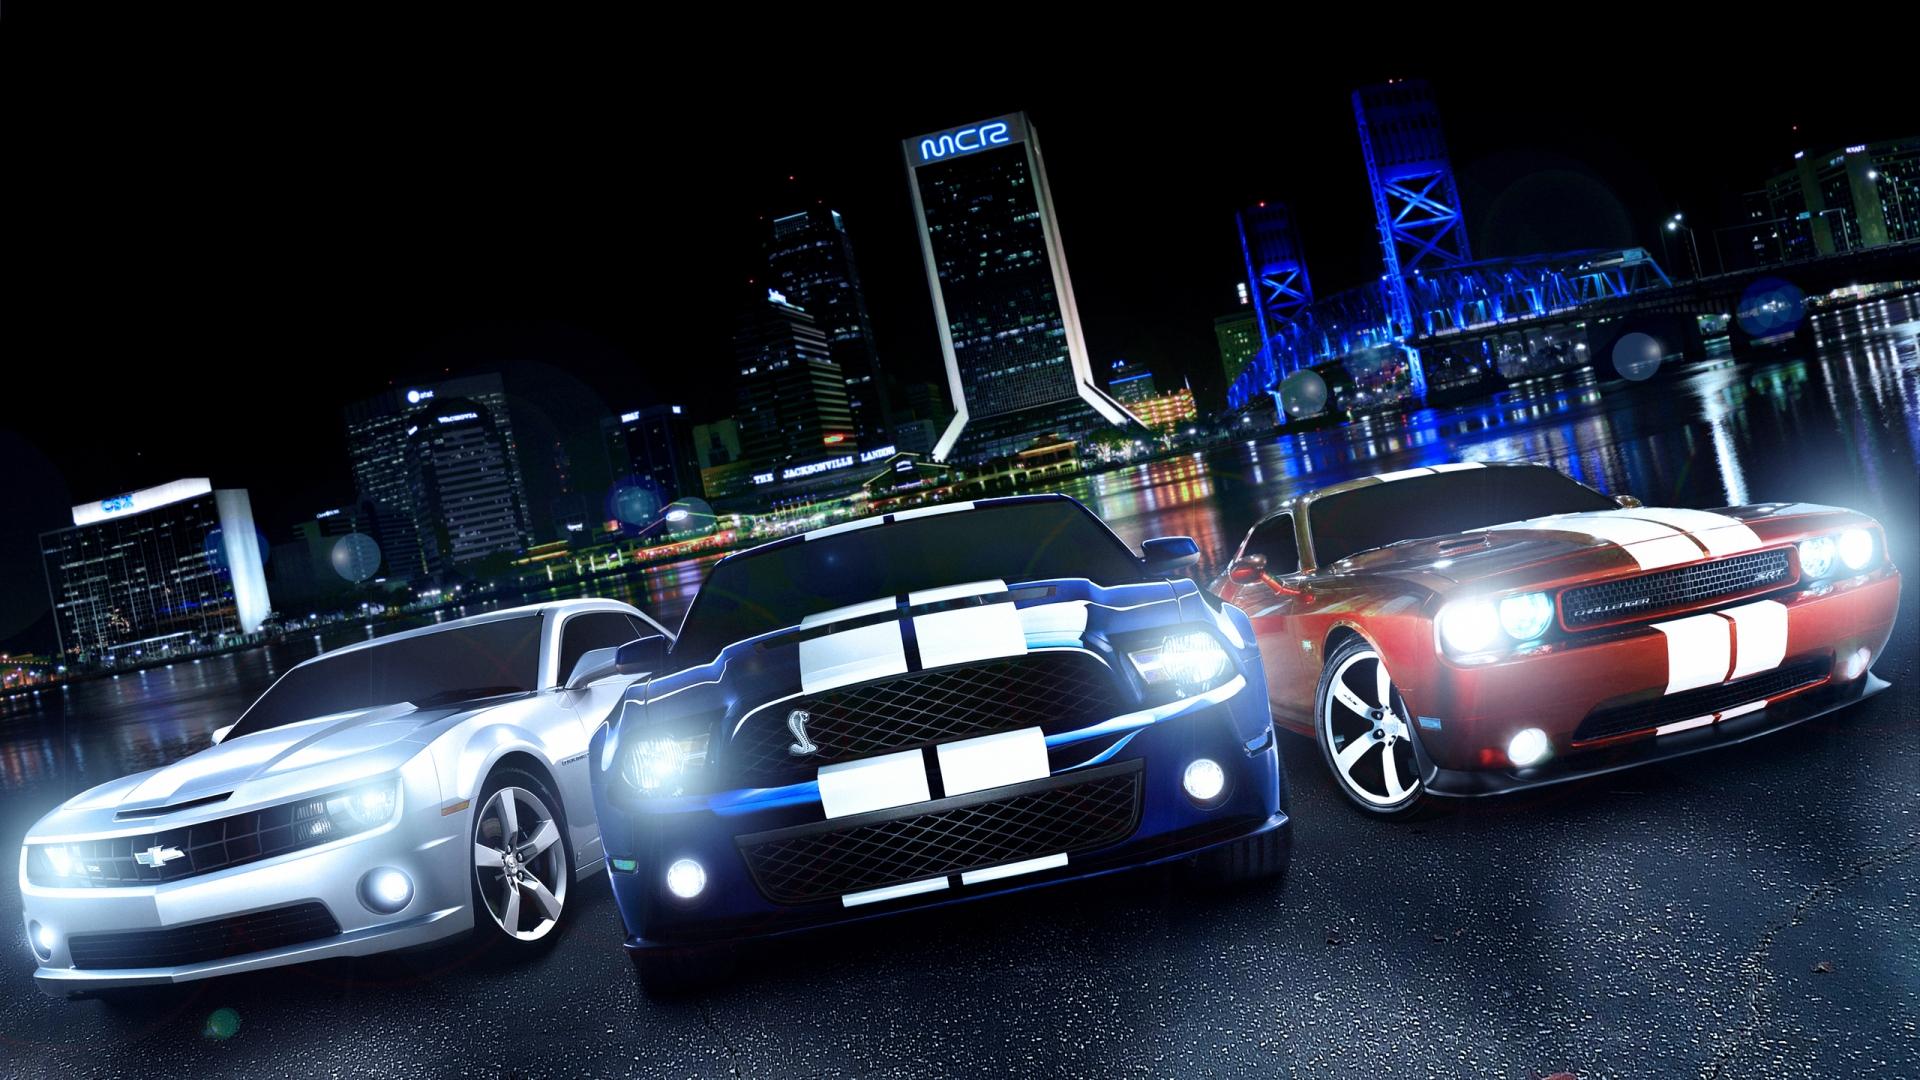 Ford Mustang Wallpaper Photos HD 1080P